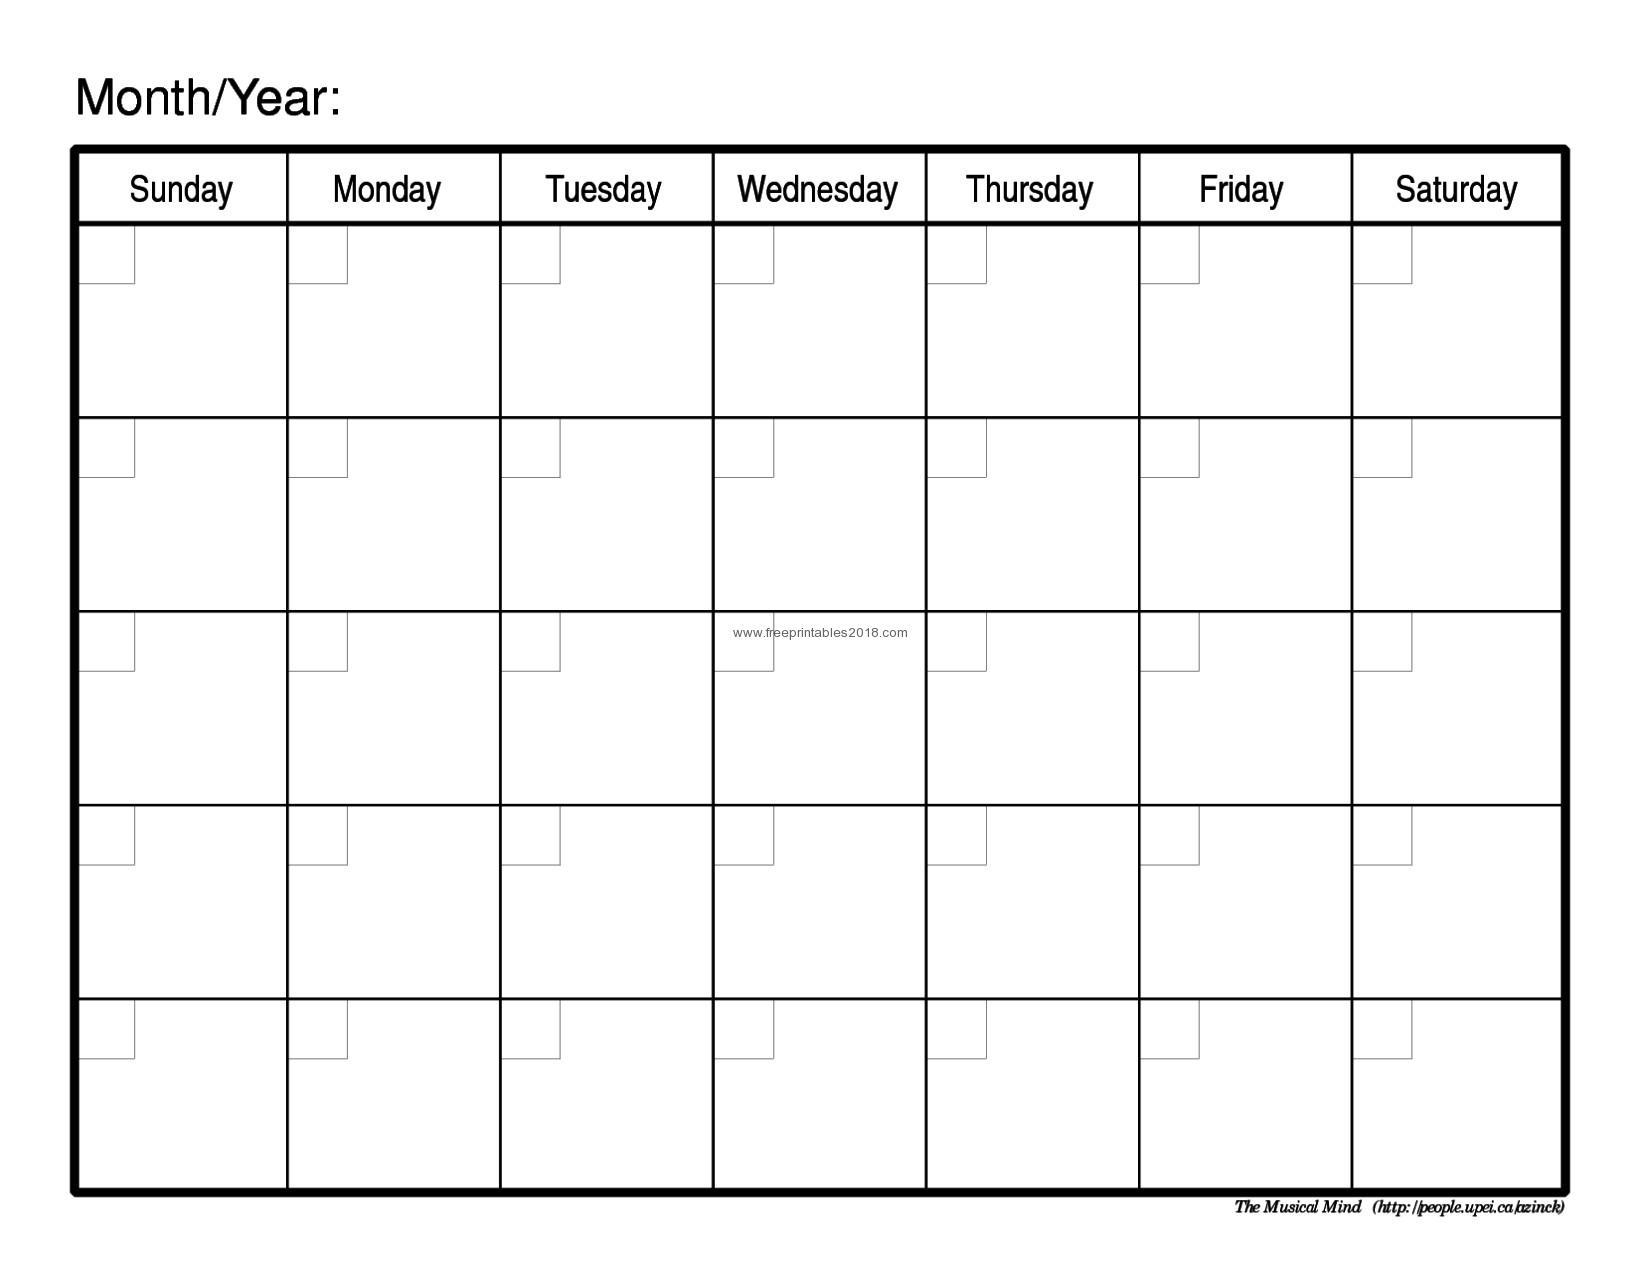 Free Printable Calendar Blank Free Printable Blank Calendar throughout Template Of A Blank Calendar Of A Month